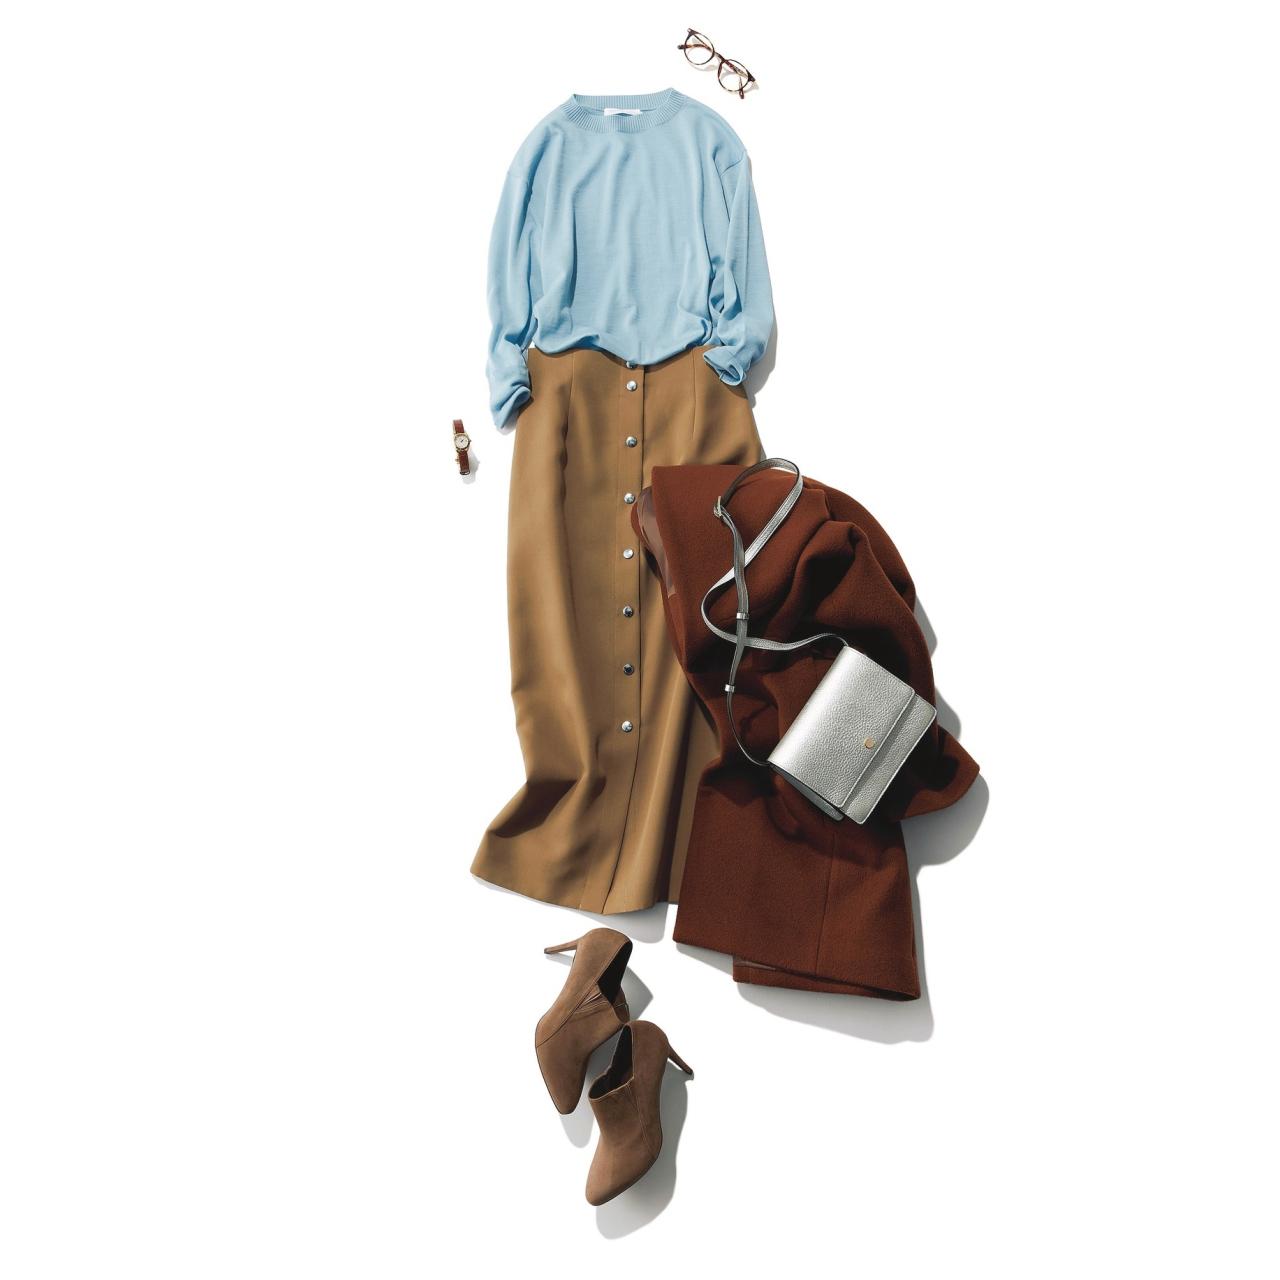 67ff9f1d408 知的なベージュの細見えスカート×華やかな印象のブルーニットを合わせてみる。ストンと落ちるタイトスカートのセンターボタンがIラインを強調して すっきり効果も。